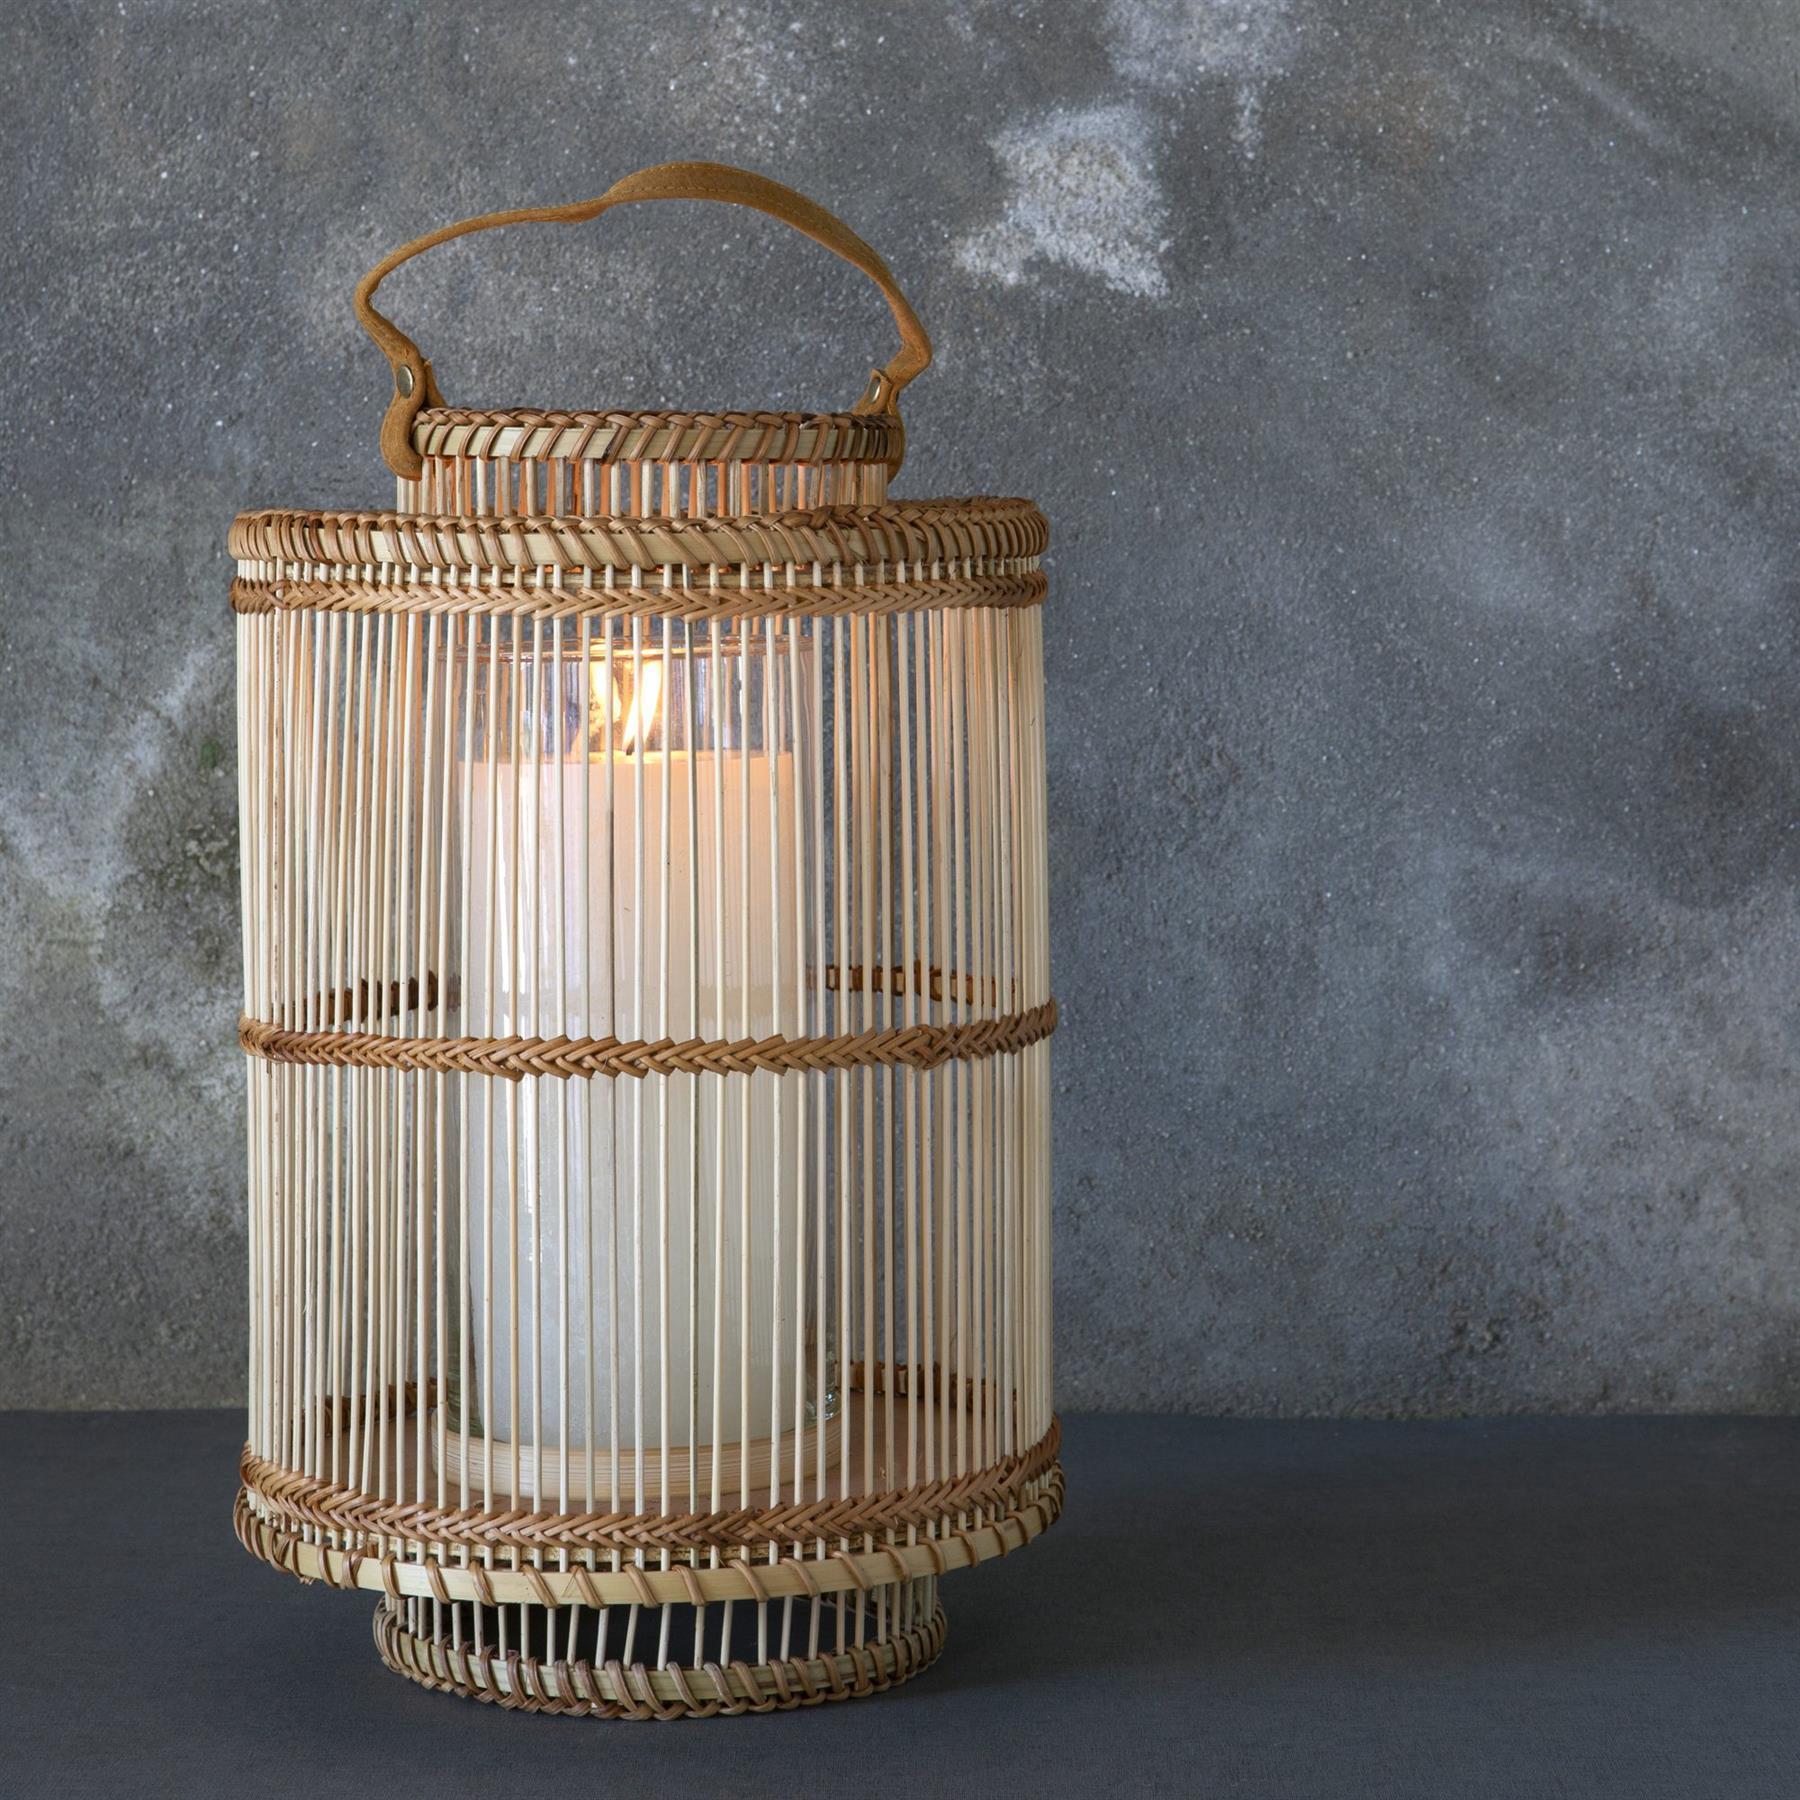 Ira Bamboo Lantern Natural Medium by Dassie Artisan